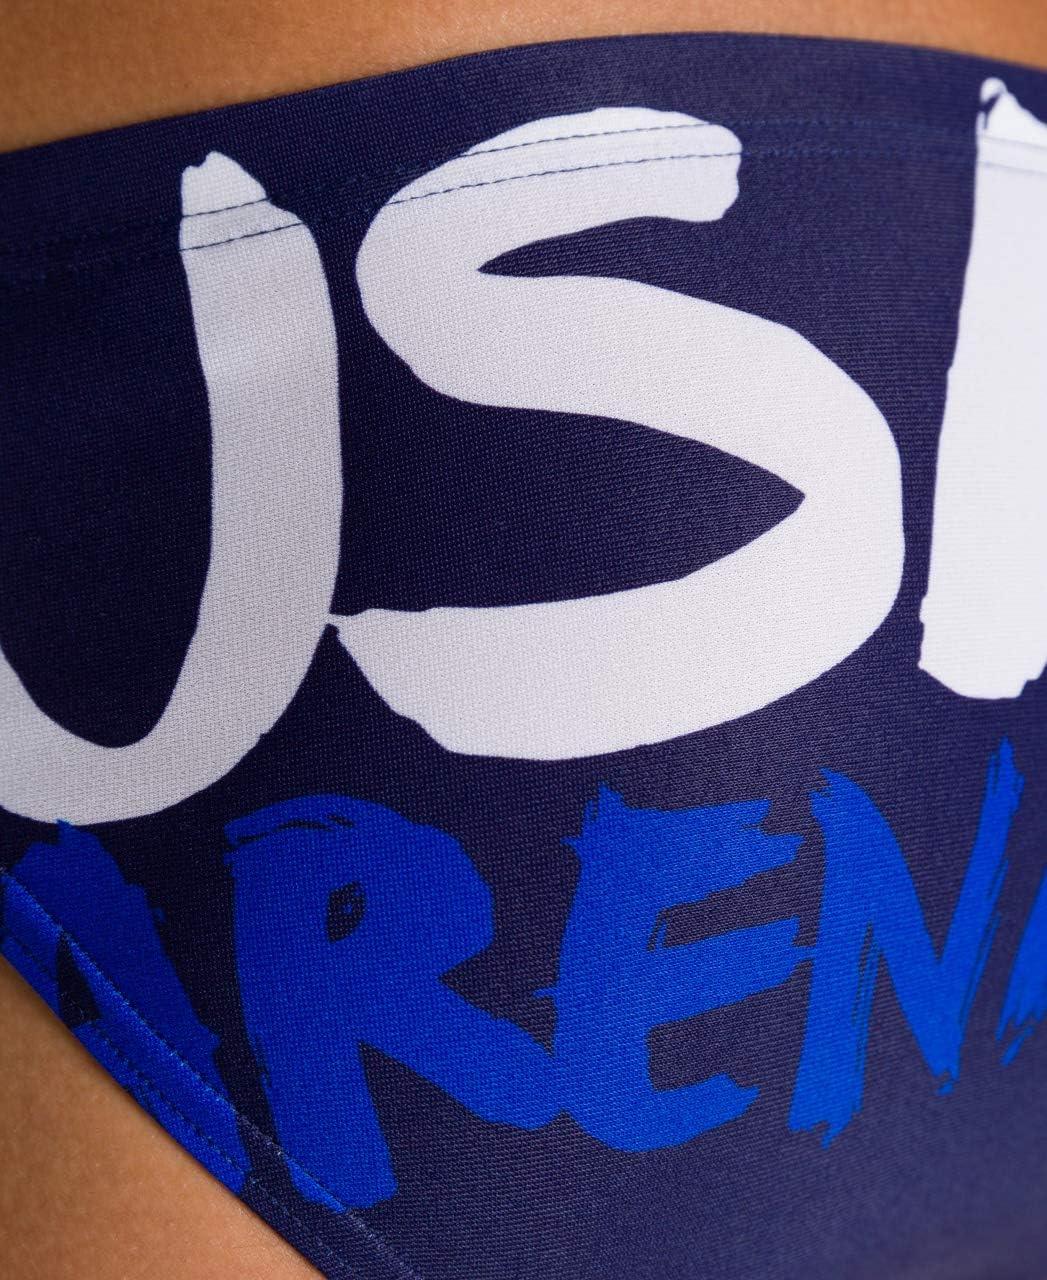 ARENA M Country Flags Brief Slip Nuoto Uomo